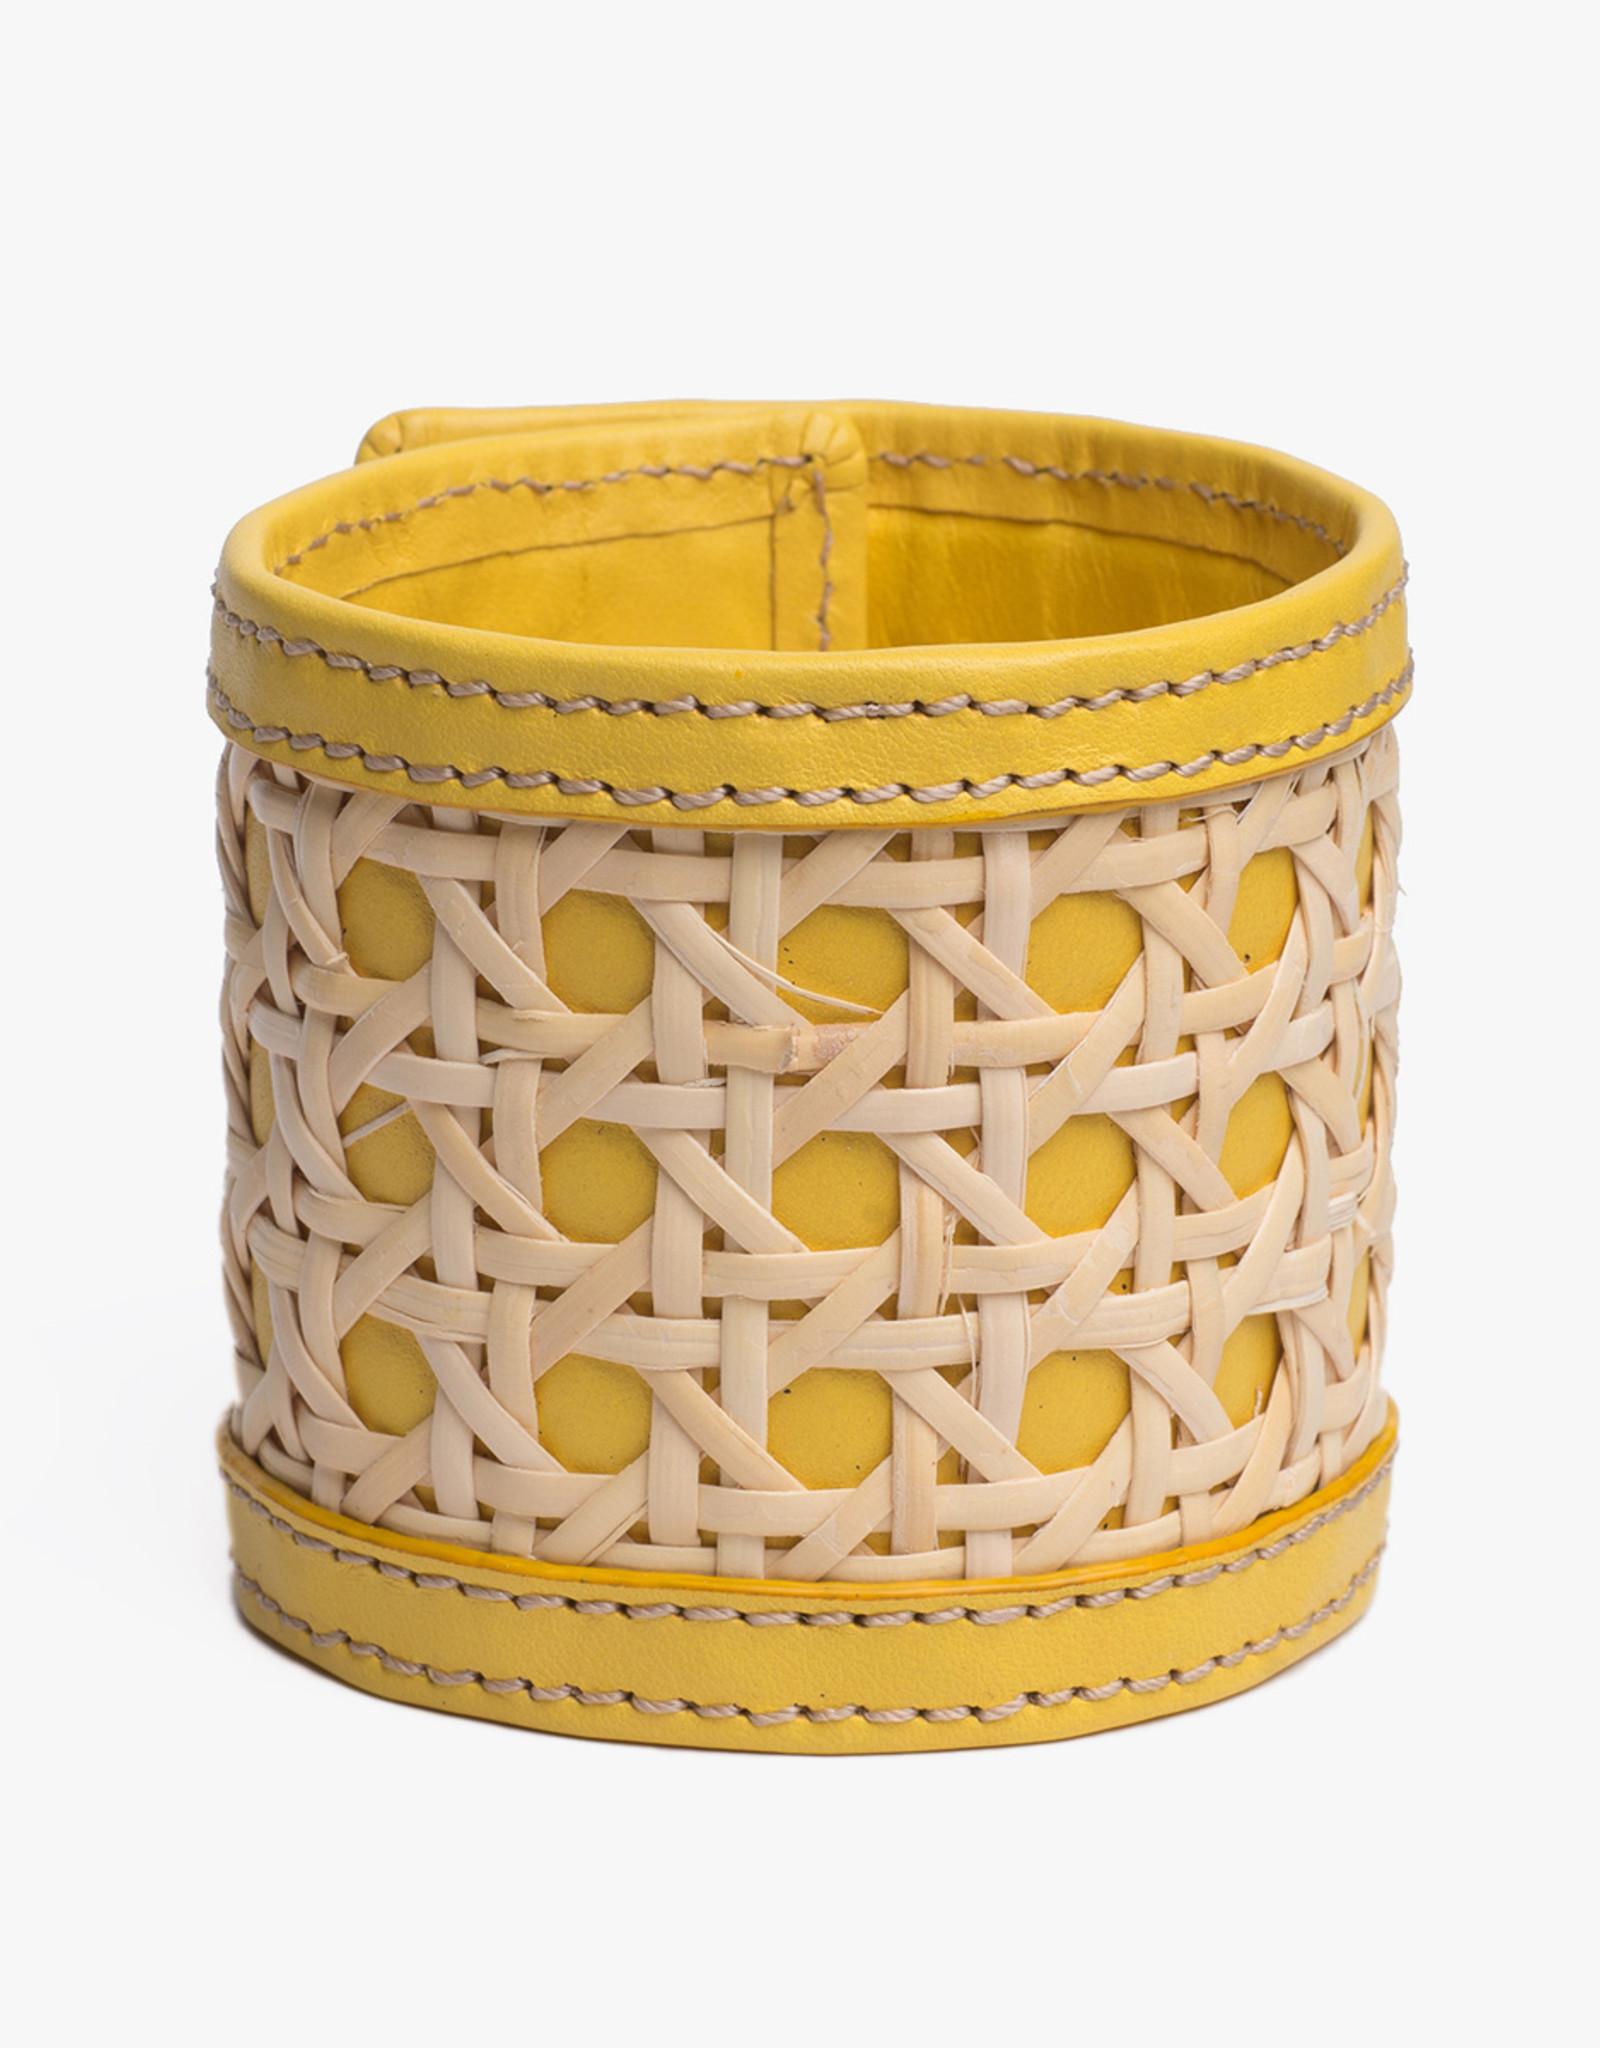 Rattan Bracelet by Palmgrens | Yellow leather